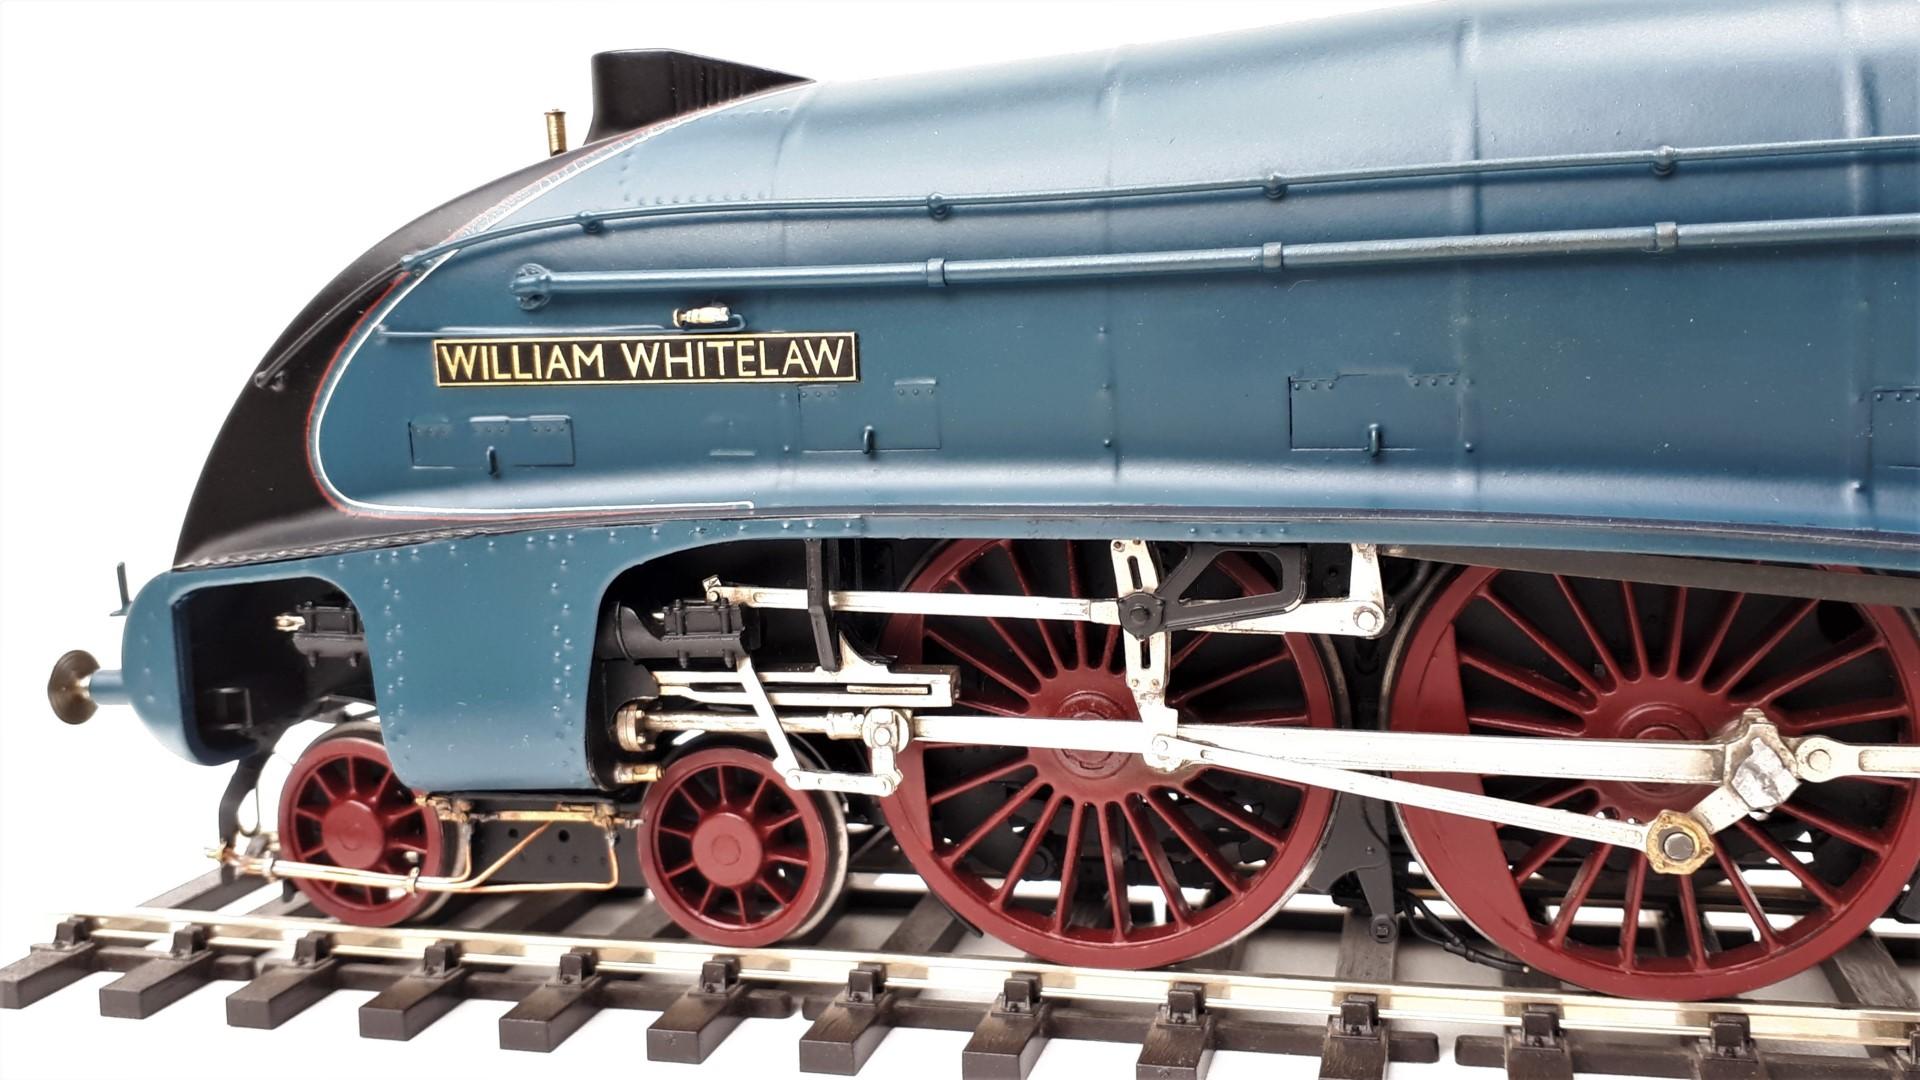 William Whitelaw